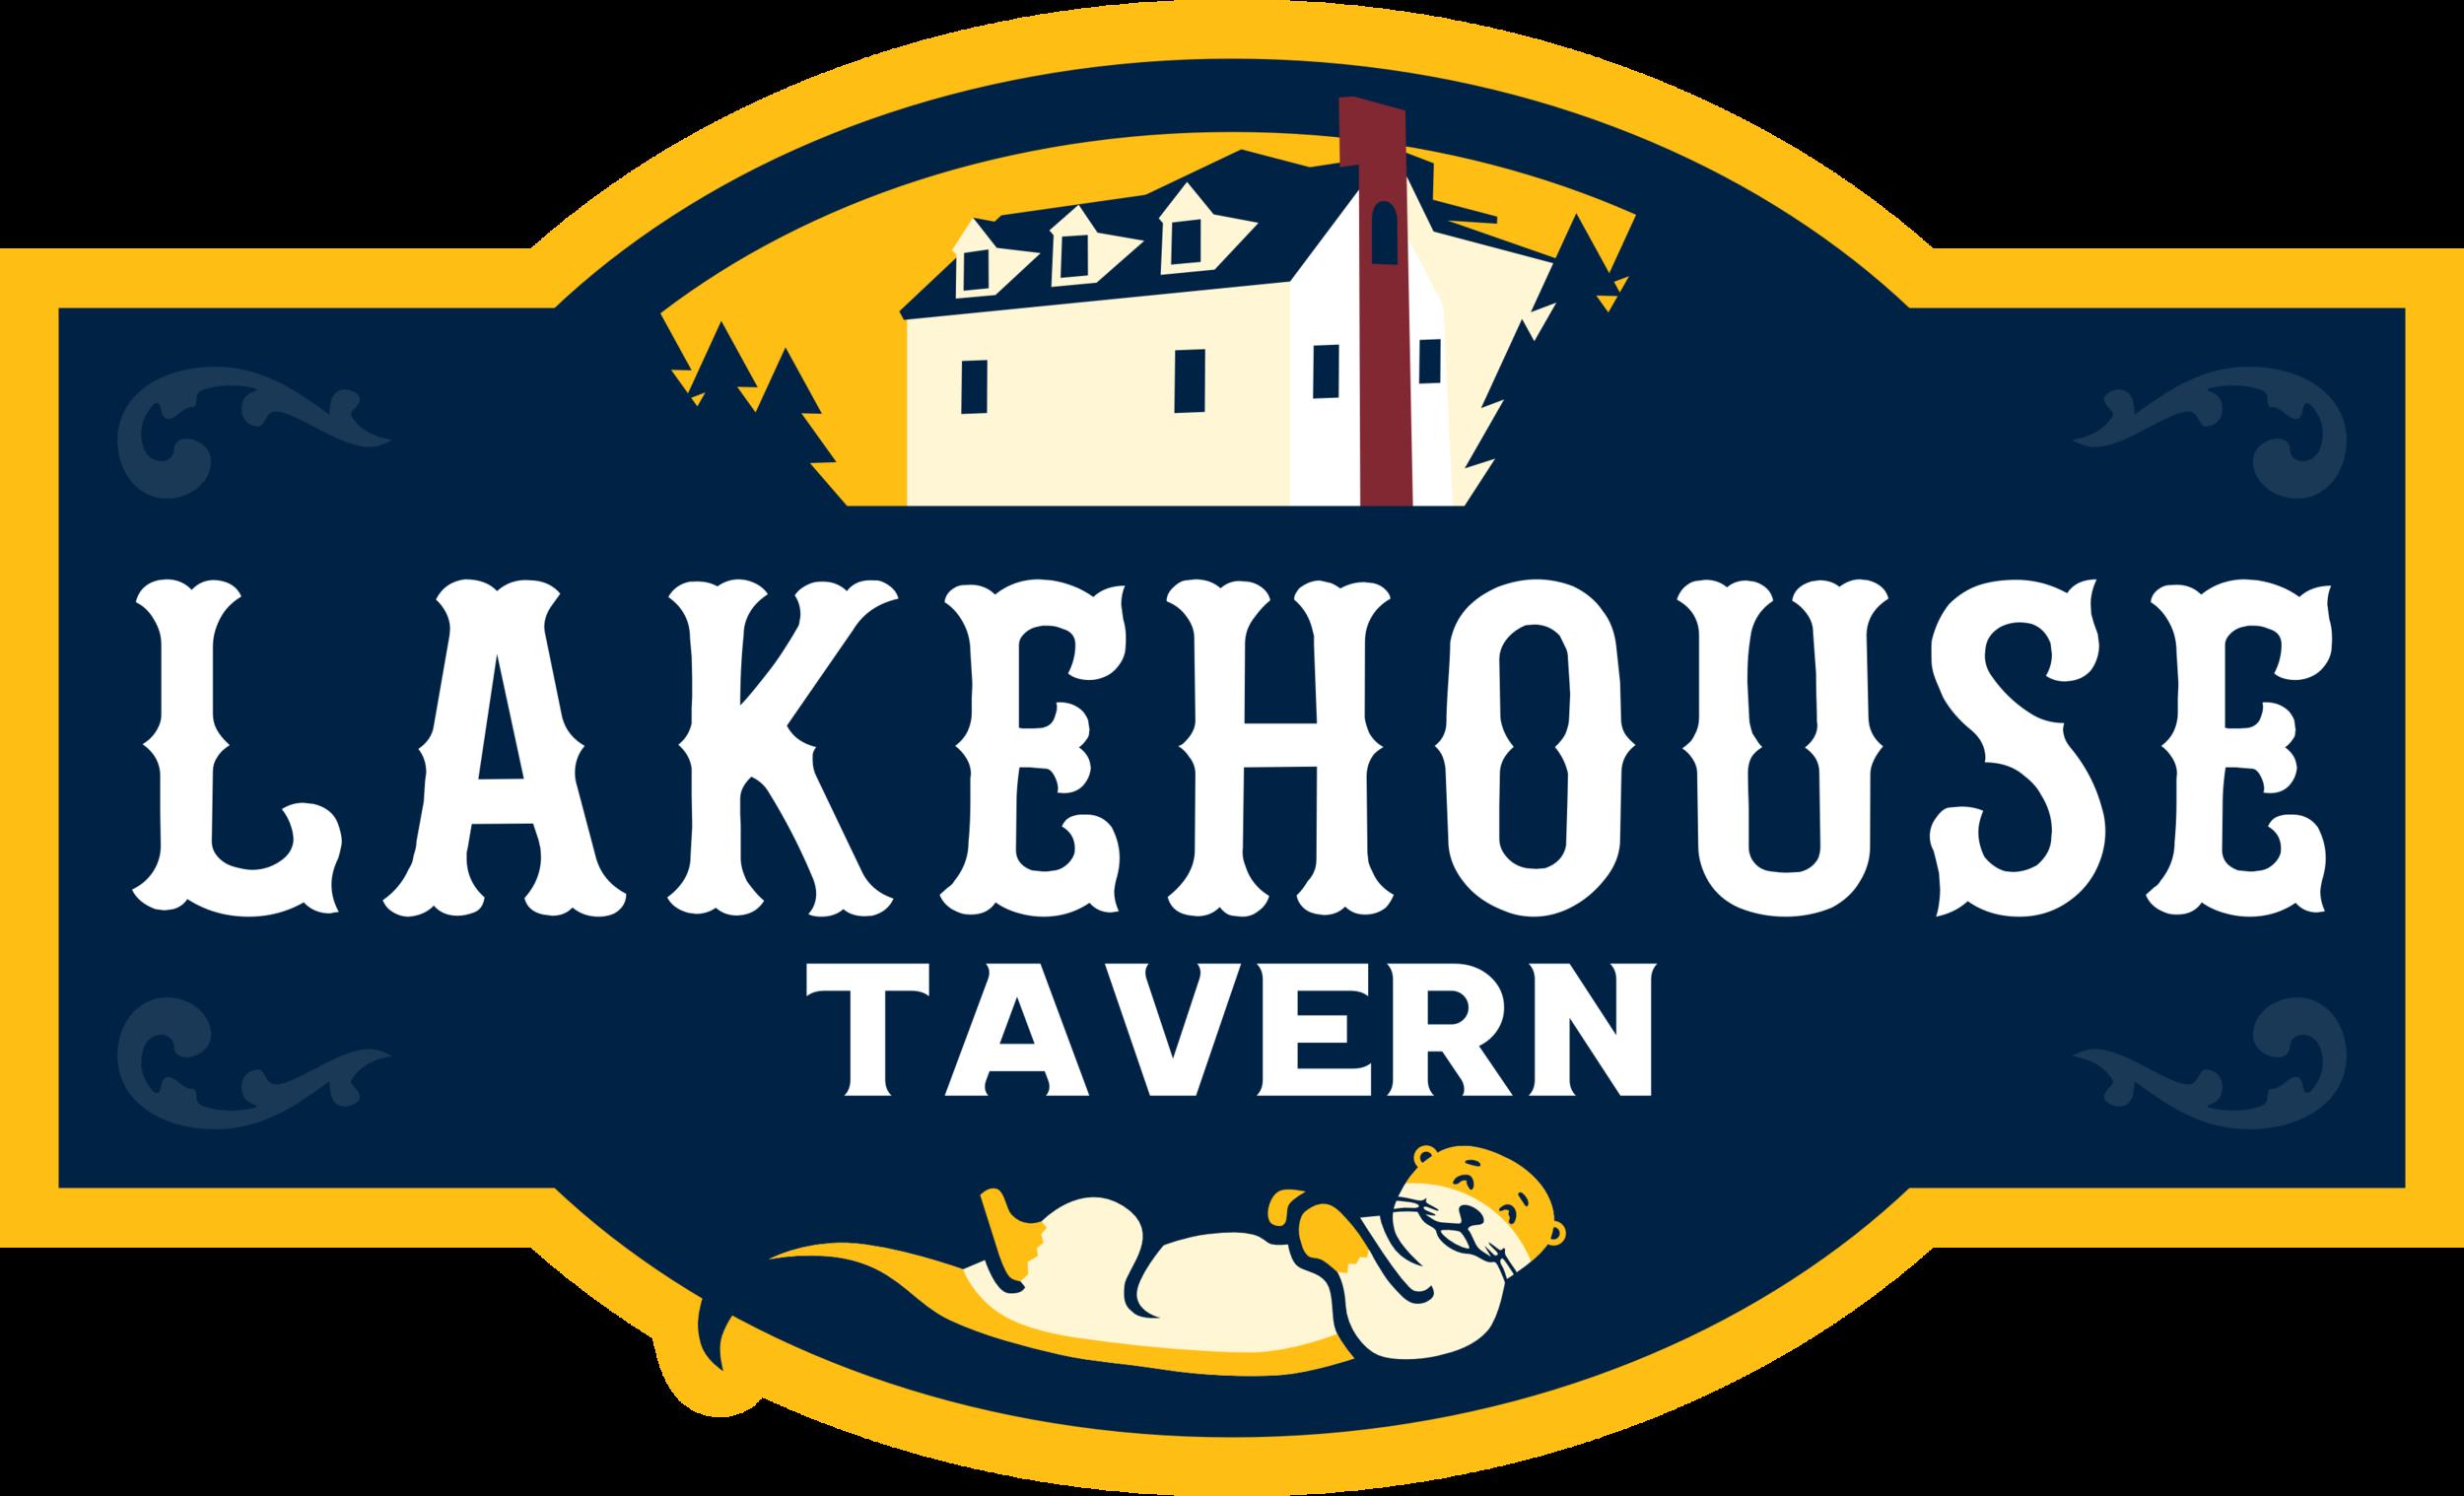 Lakehouse_Tavern_Primary_Logo_Full.png